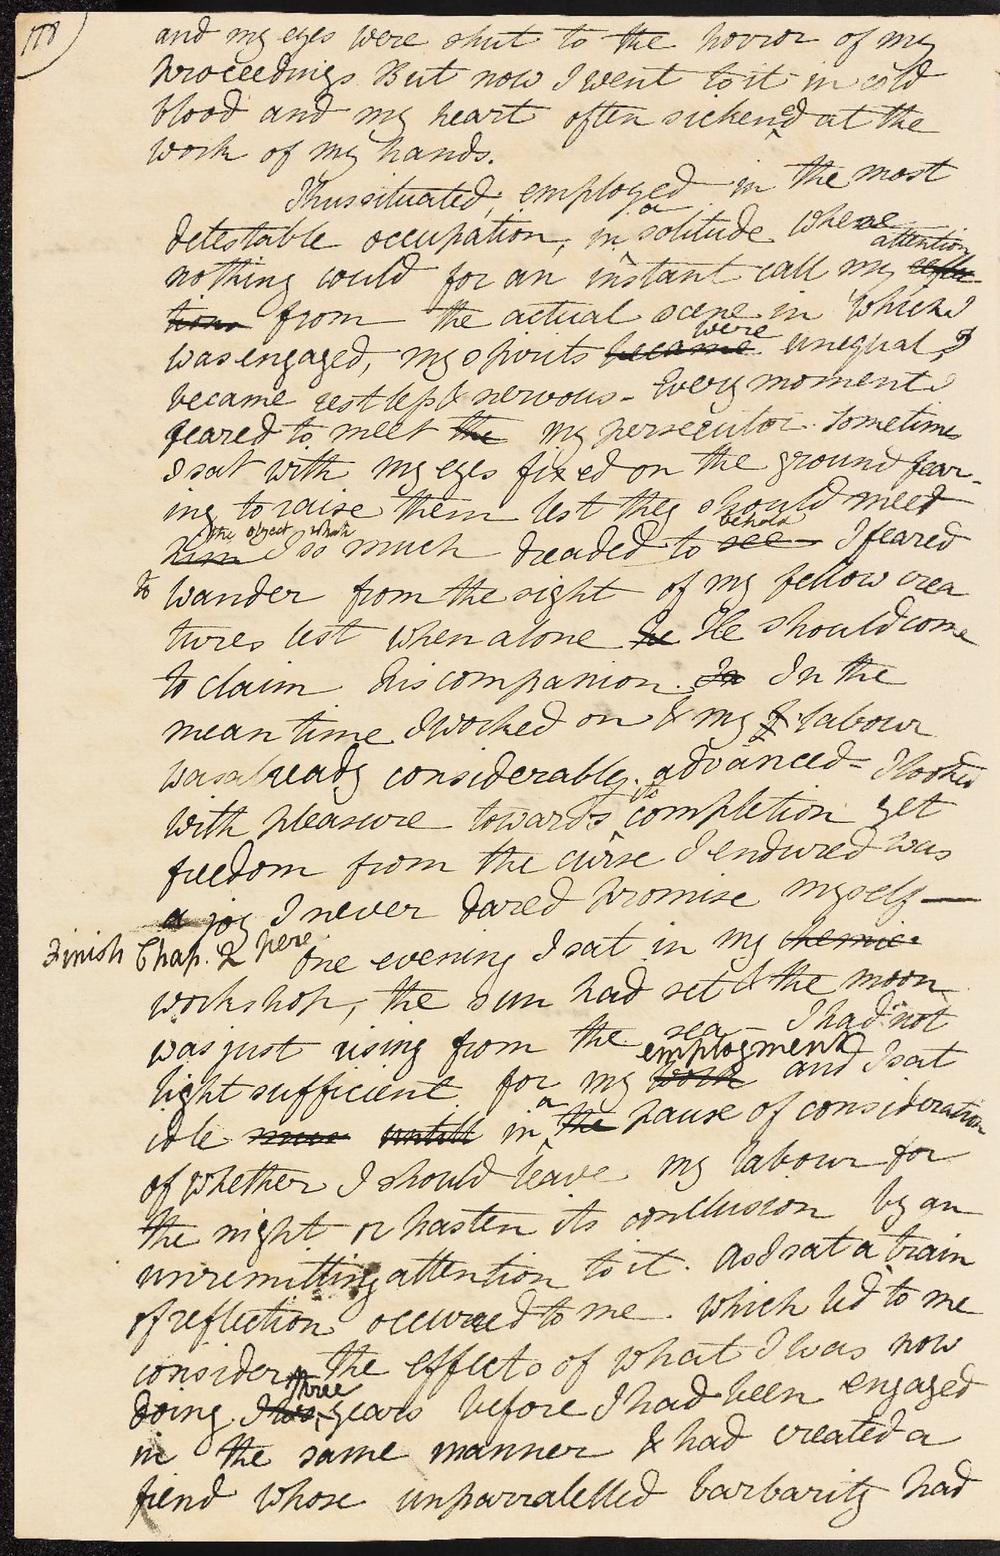 Mary Shelley, Frankenstein: autograph working draft